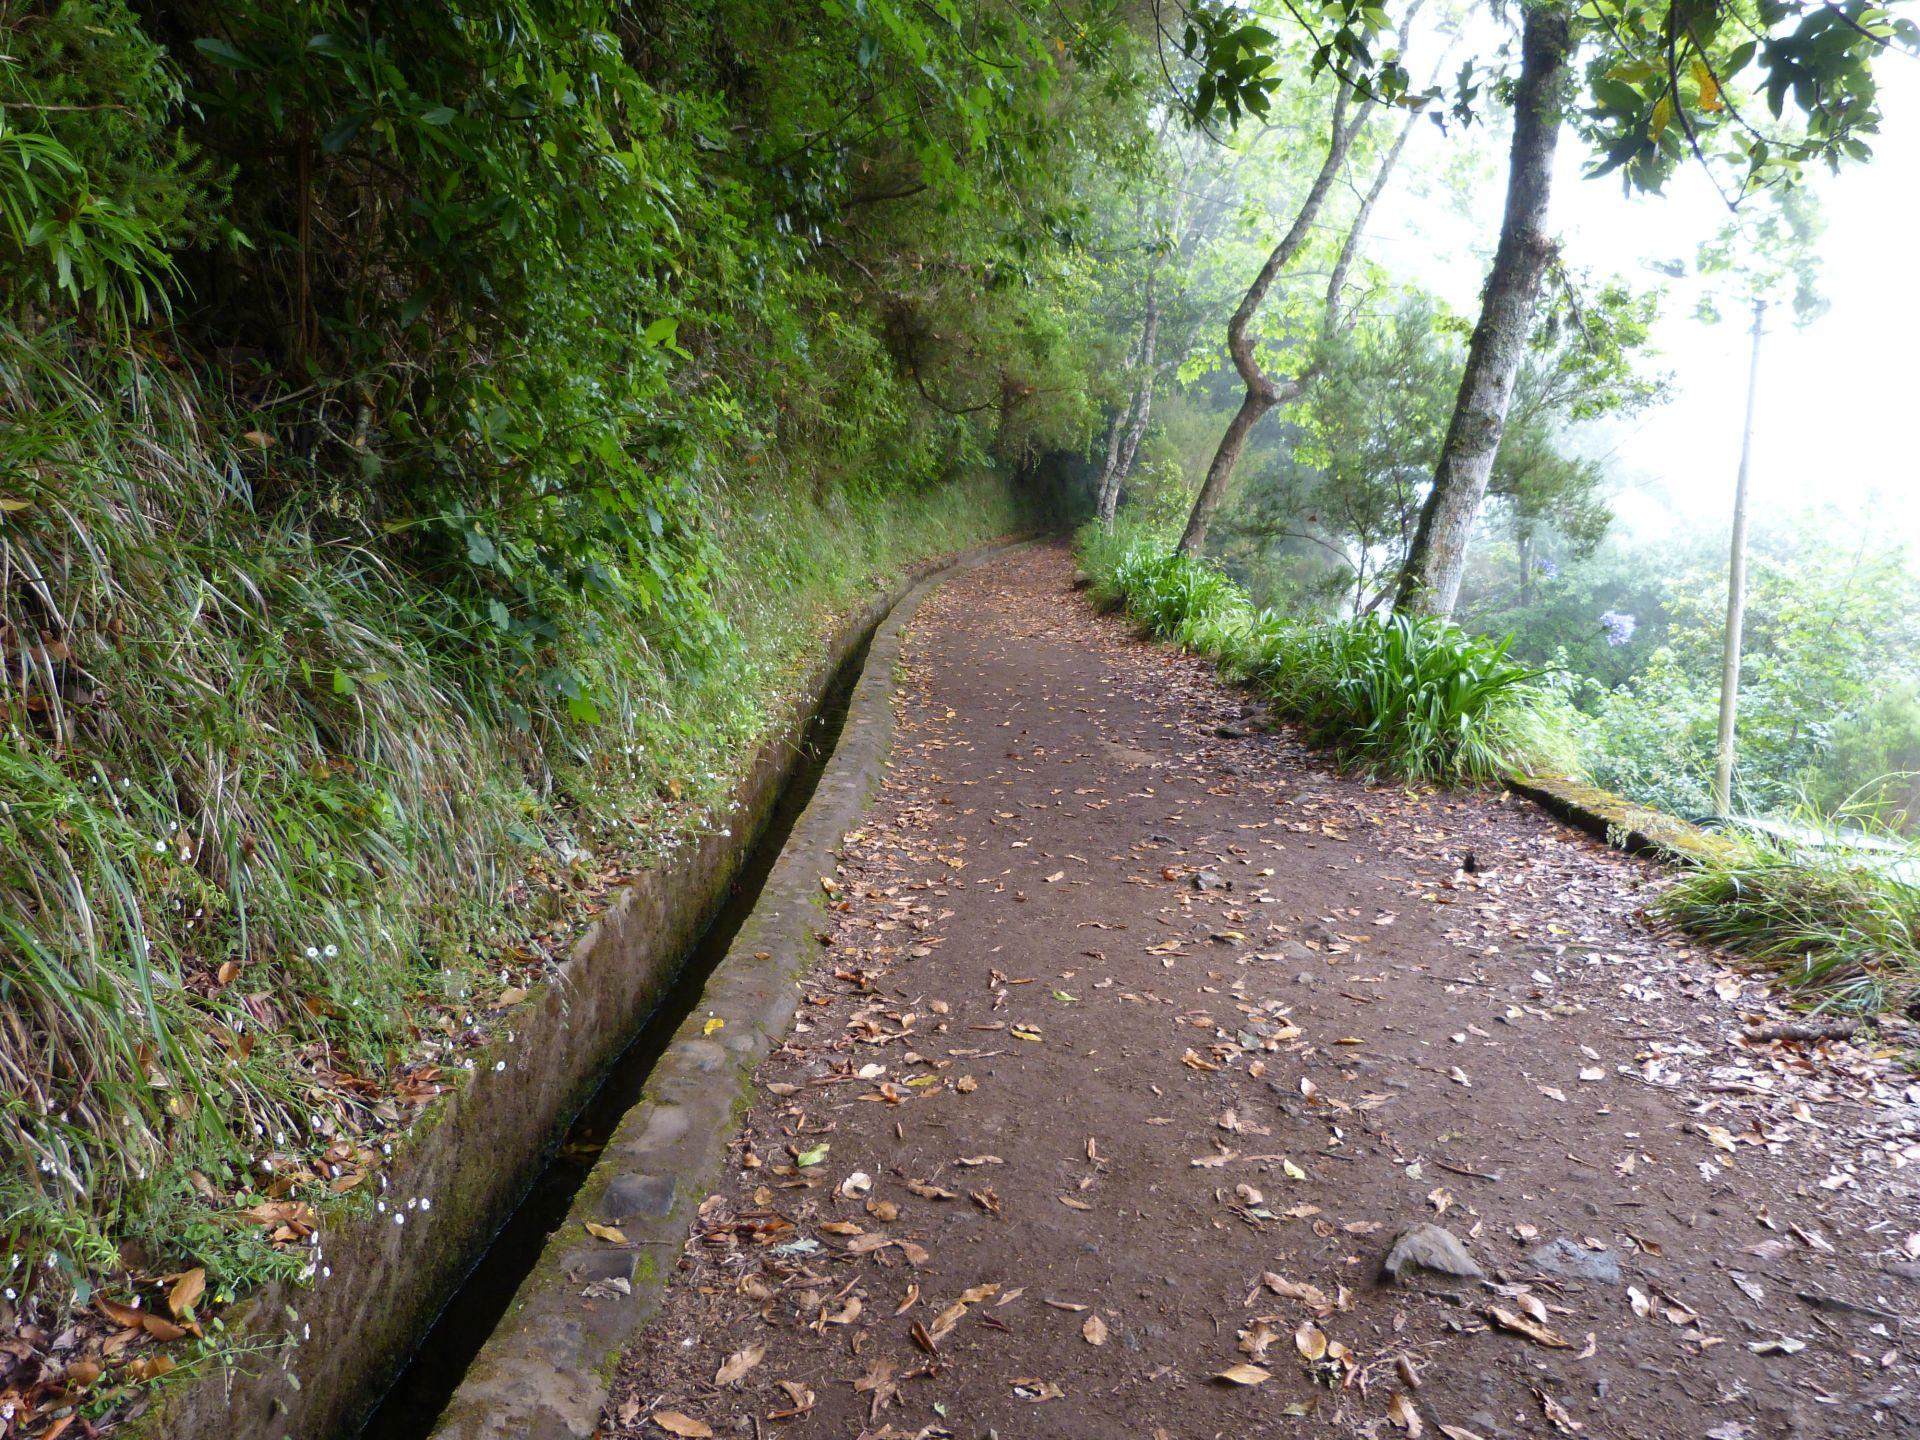 Levadawanderung zum Aussichtspunkt Balcoes